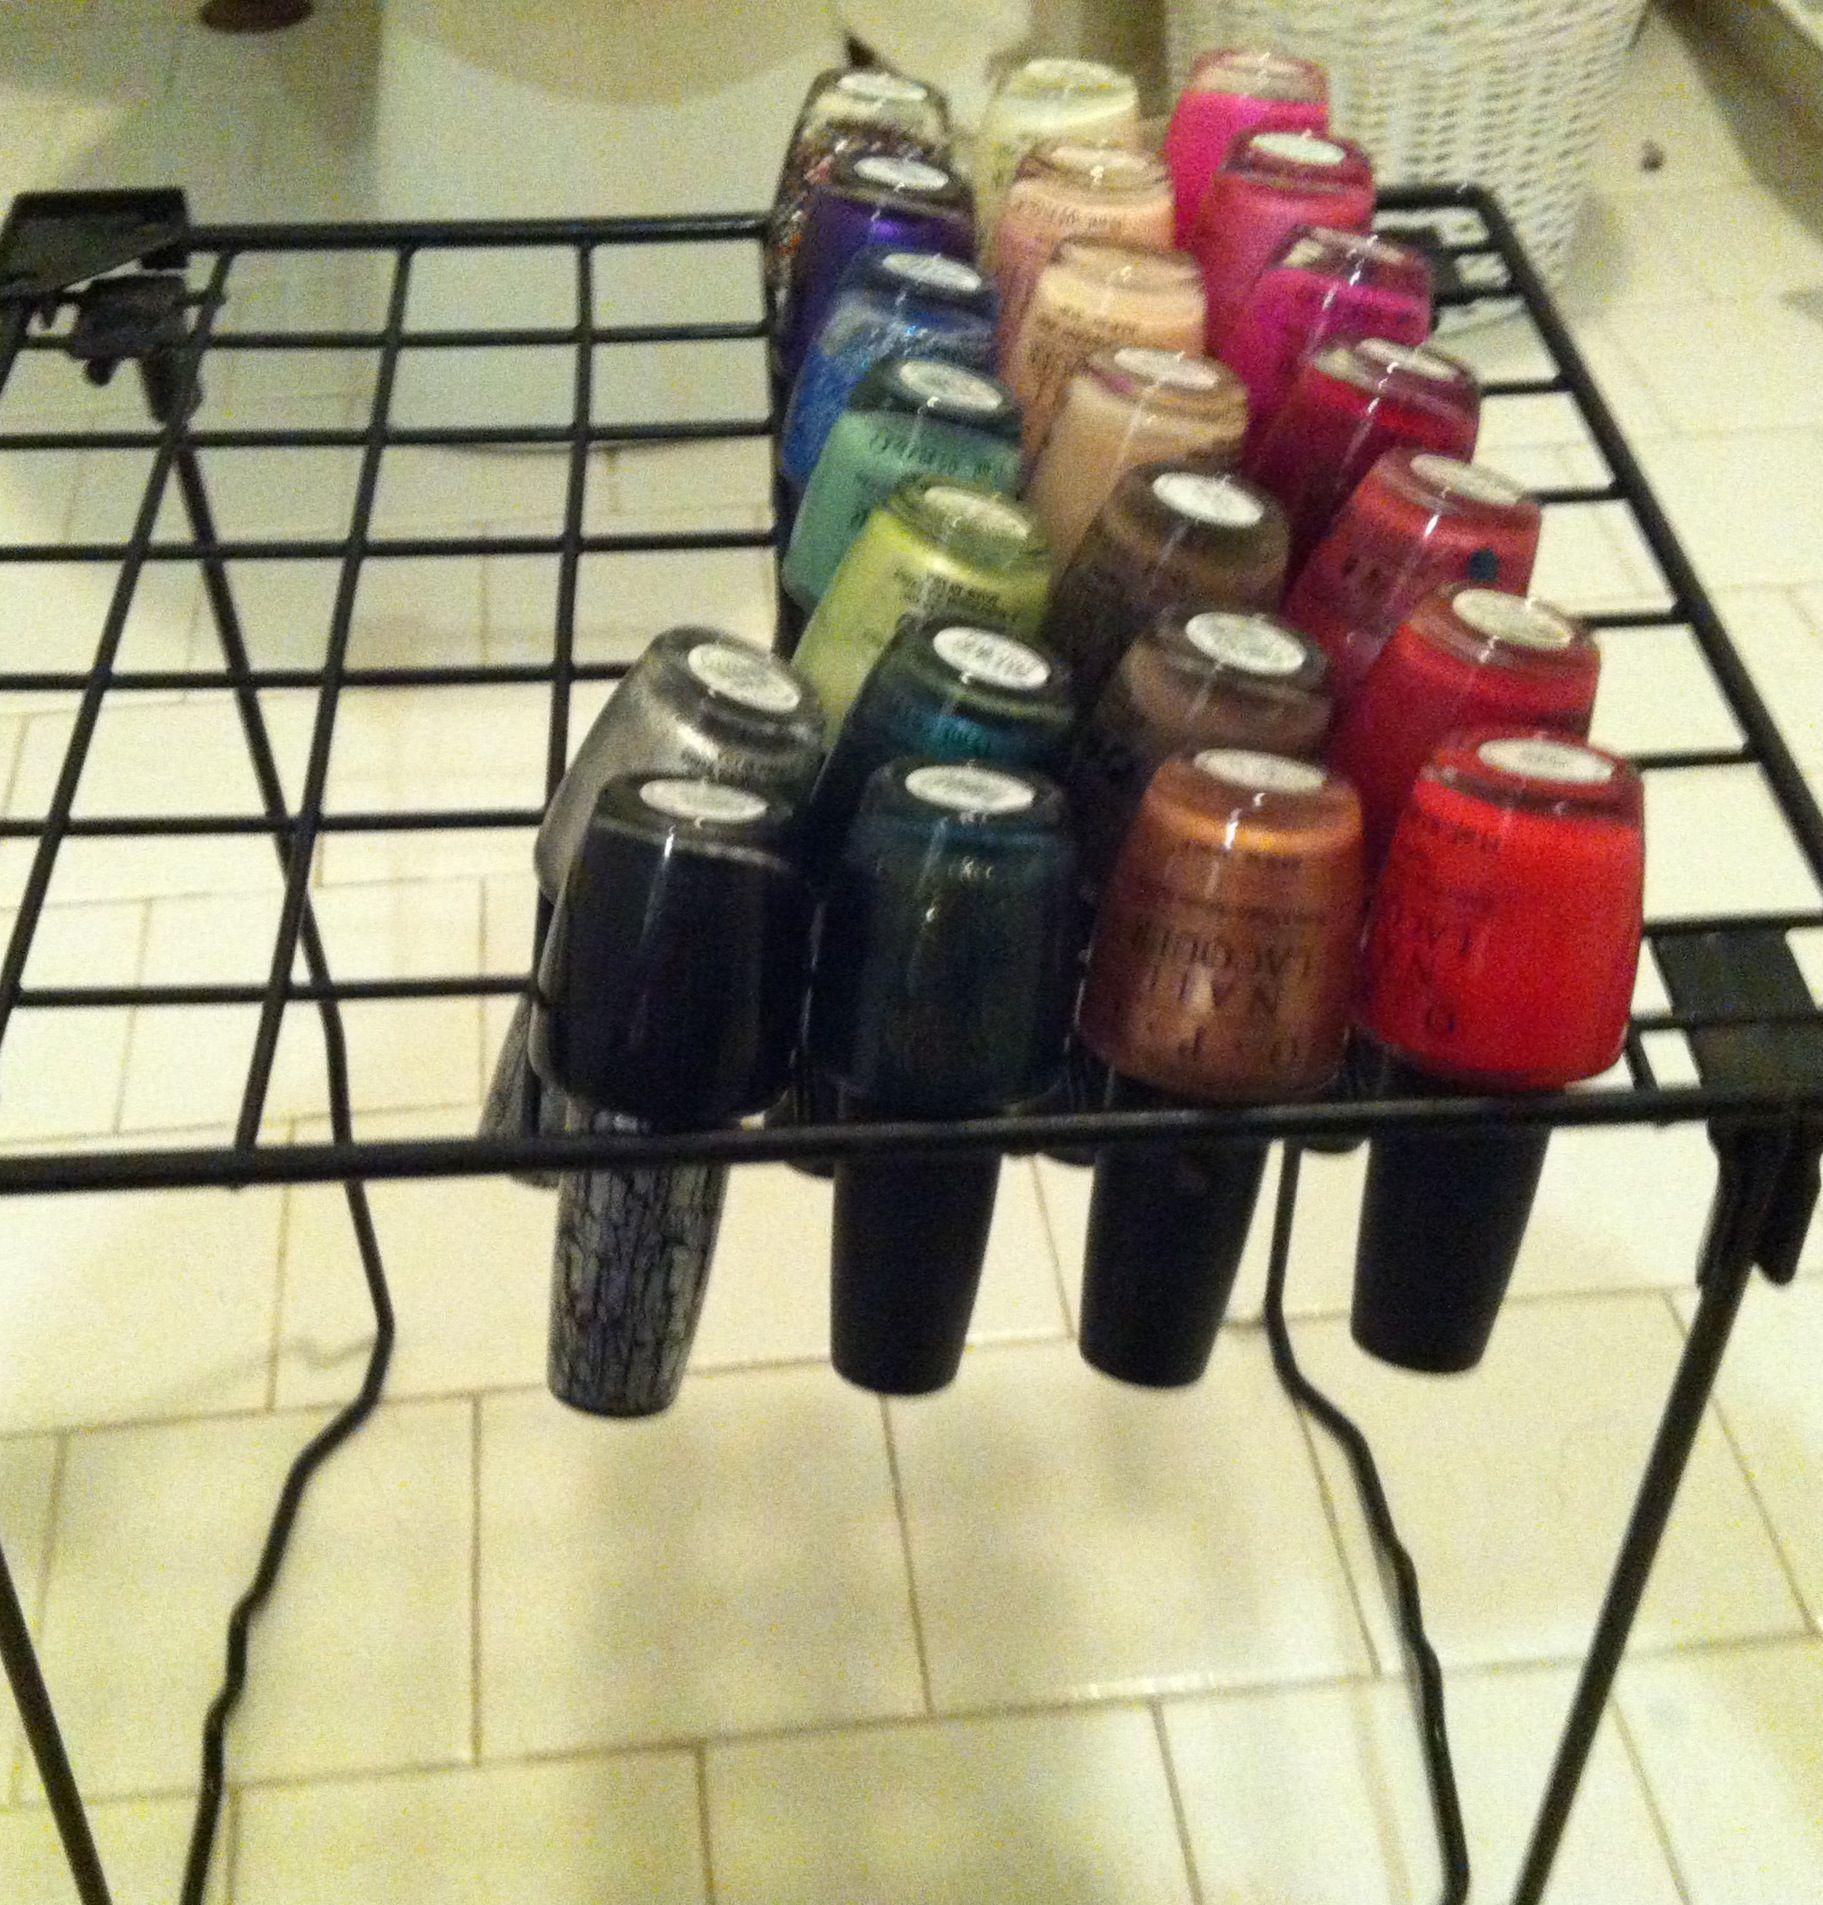 Use An Old Locker Shelf To Organize Nail Polish Nail Polish Storage Diy Dollar Store Diy Diy Nail Polish